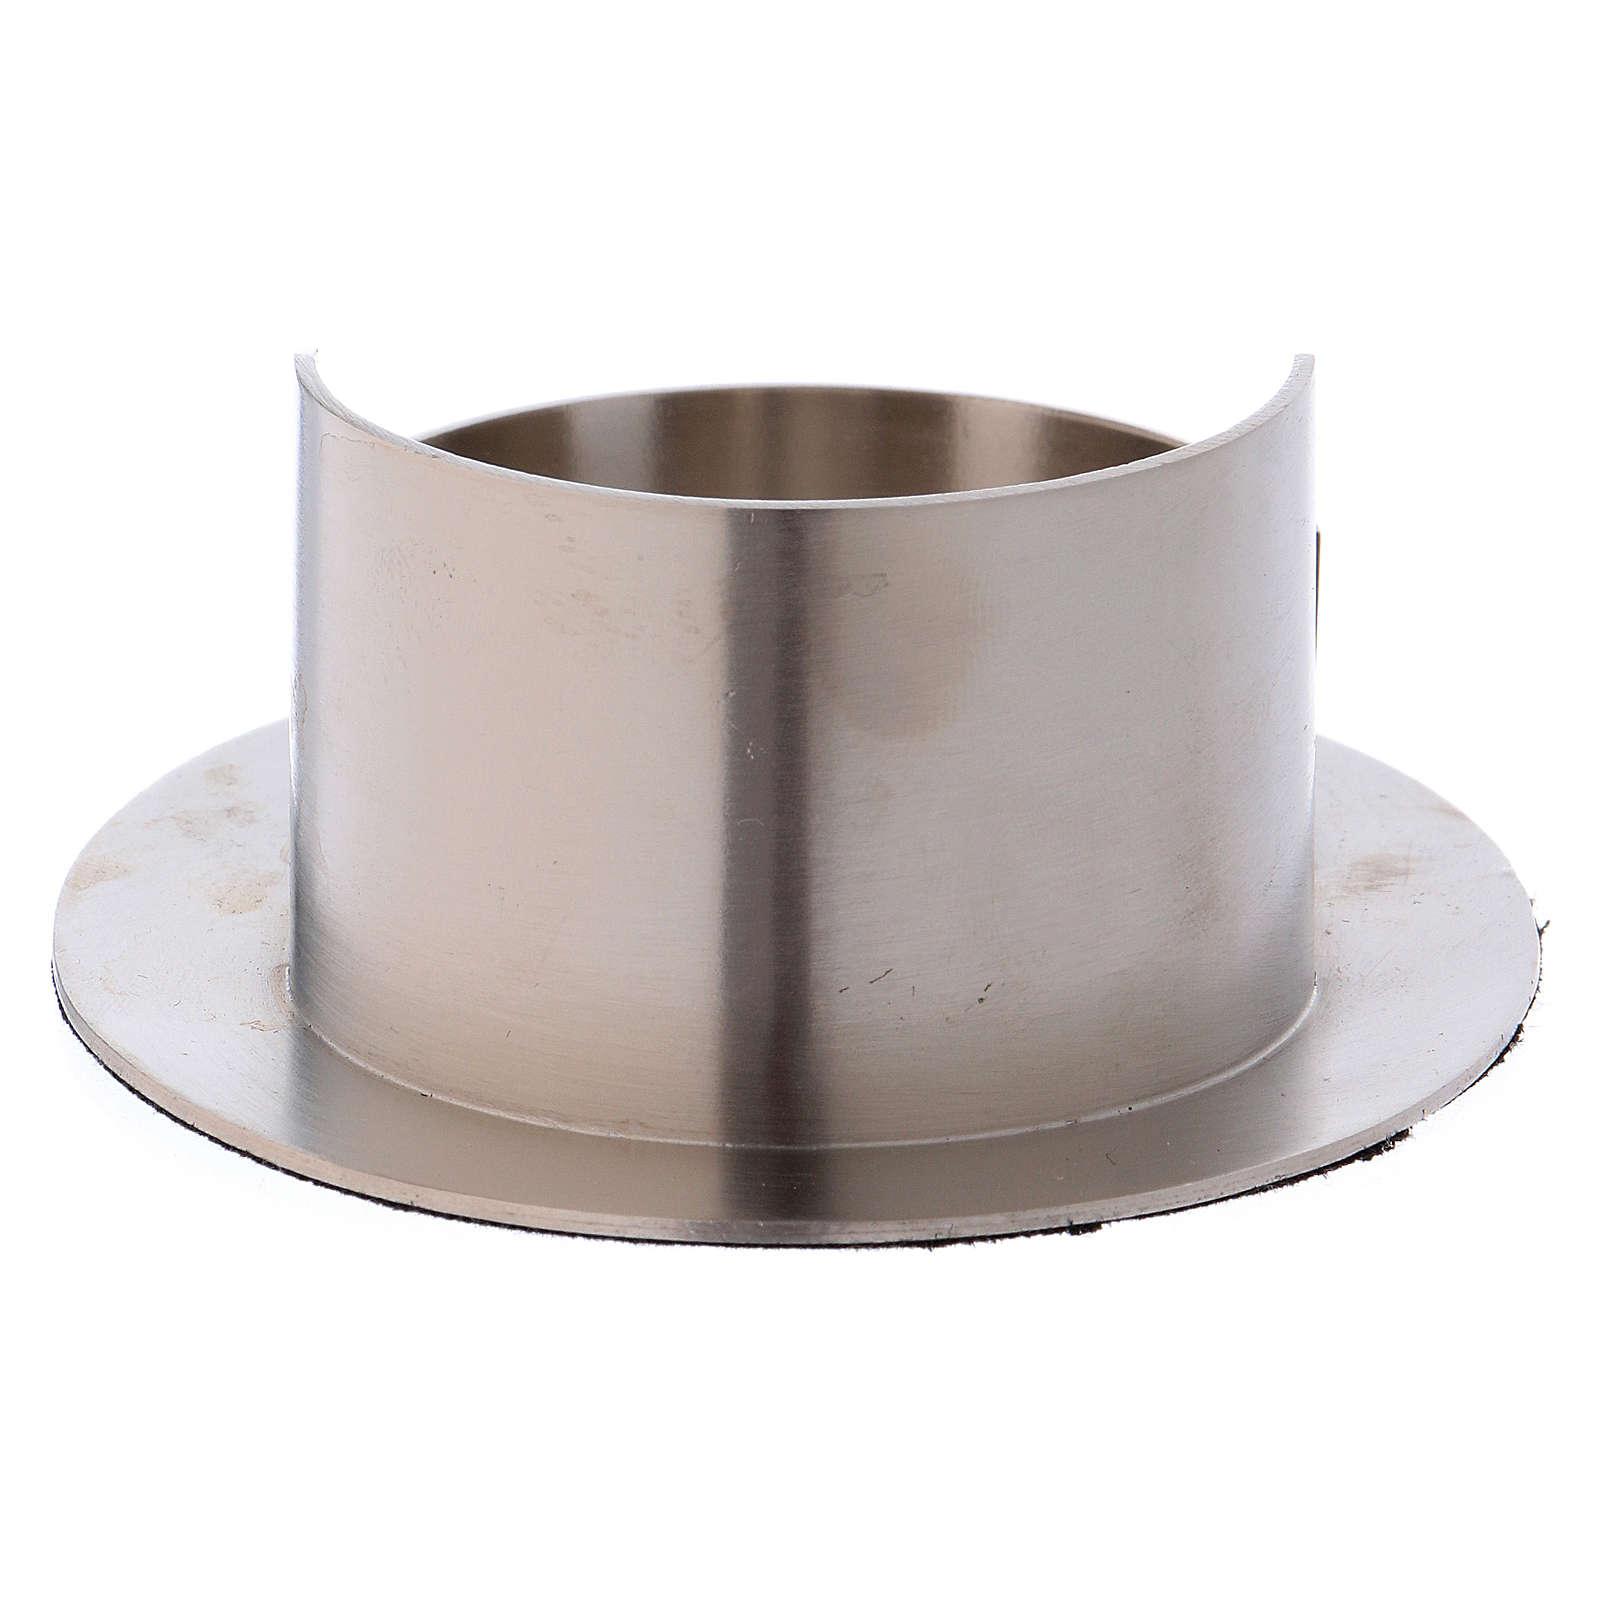 Portacandele tubo ovale ottone argentato satinato  4